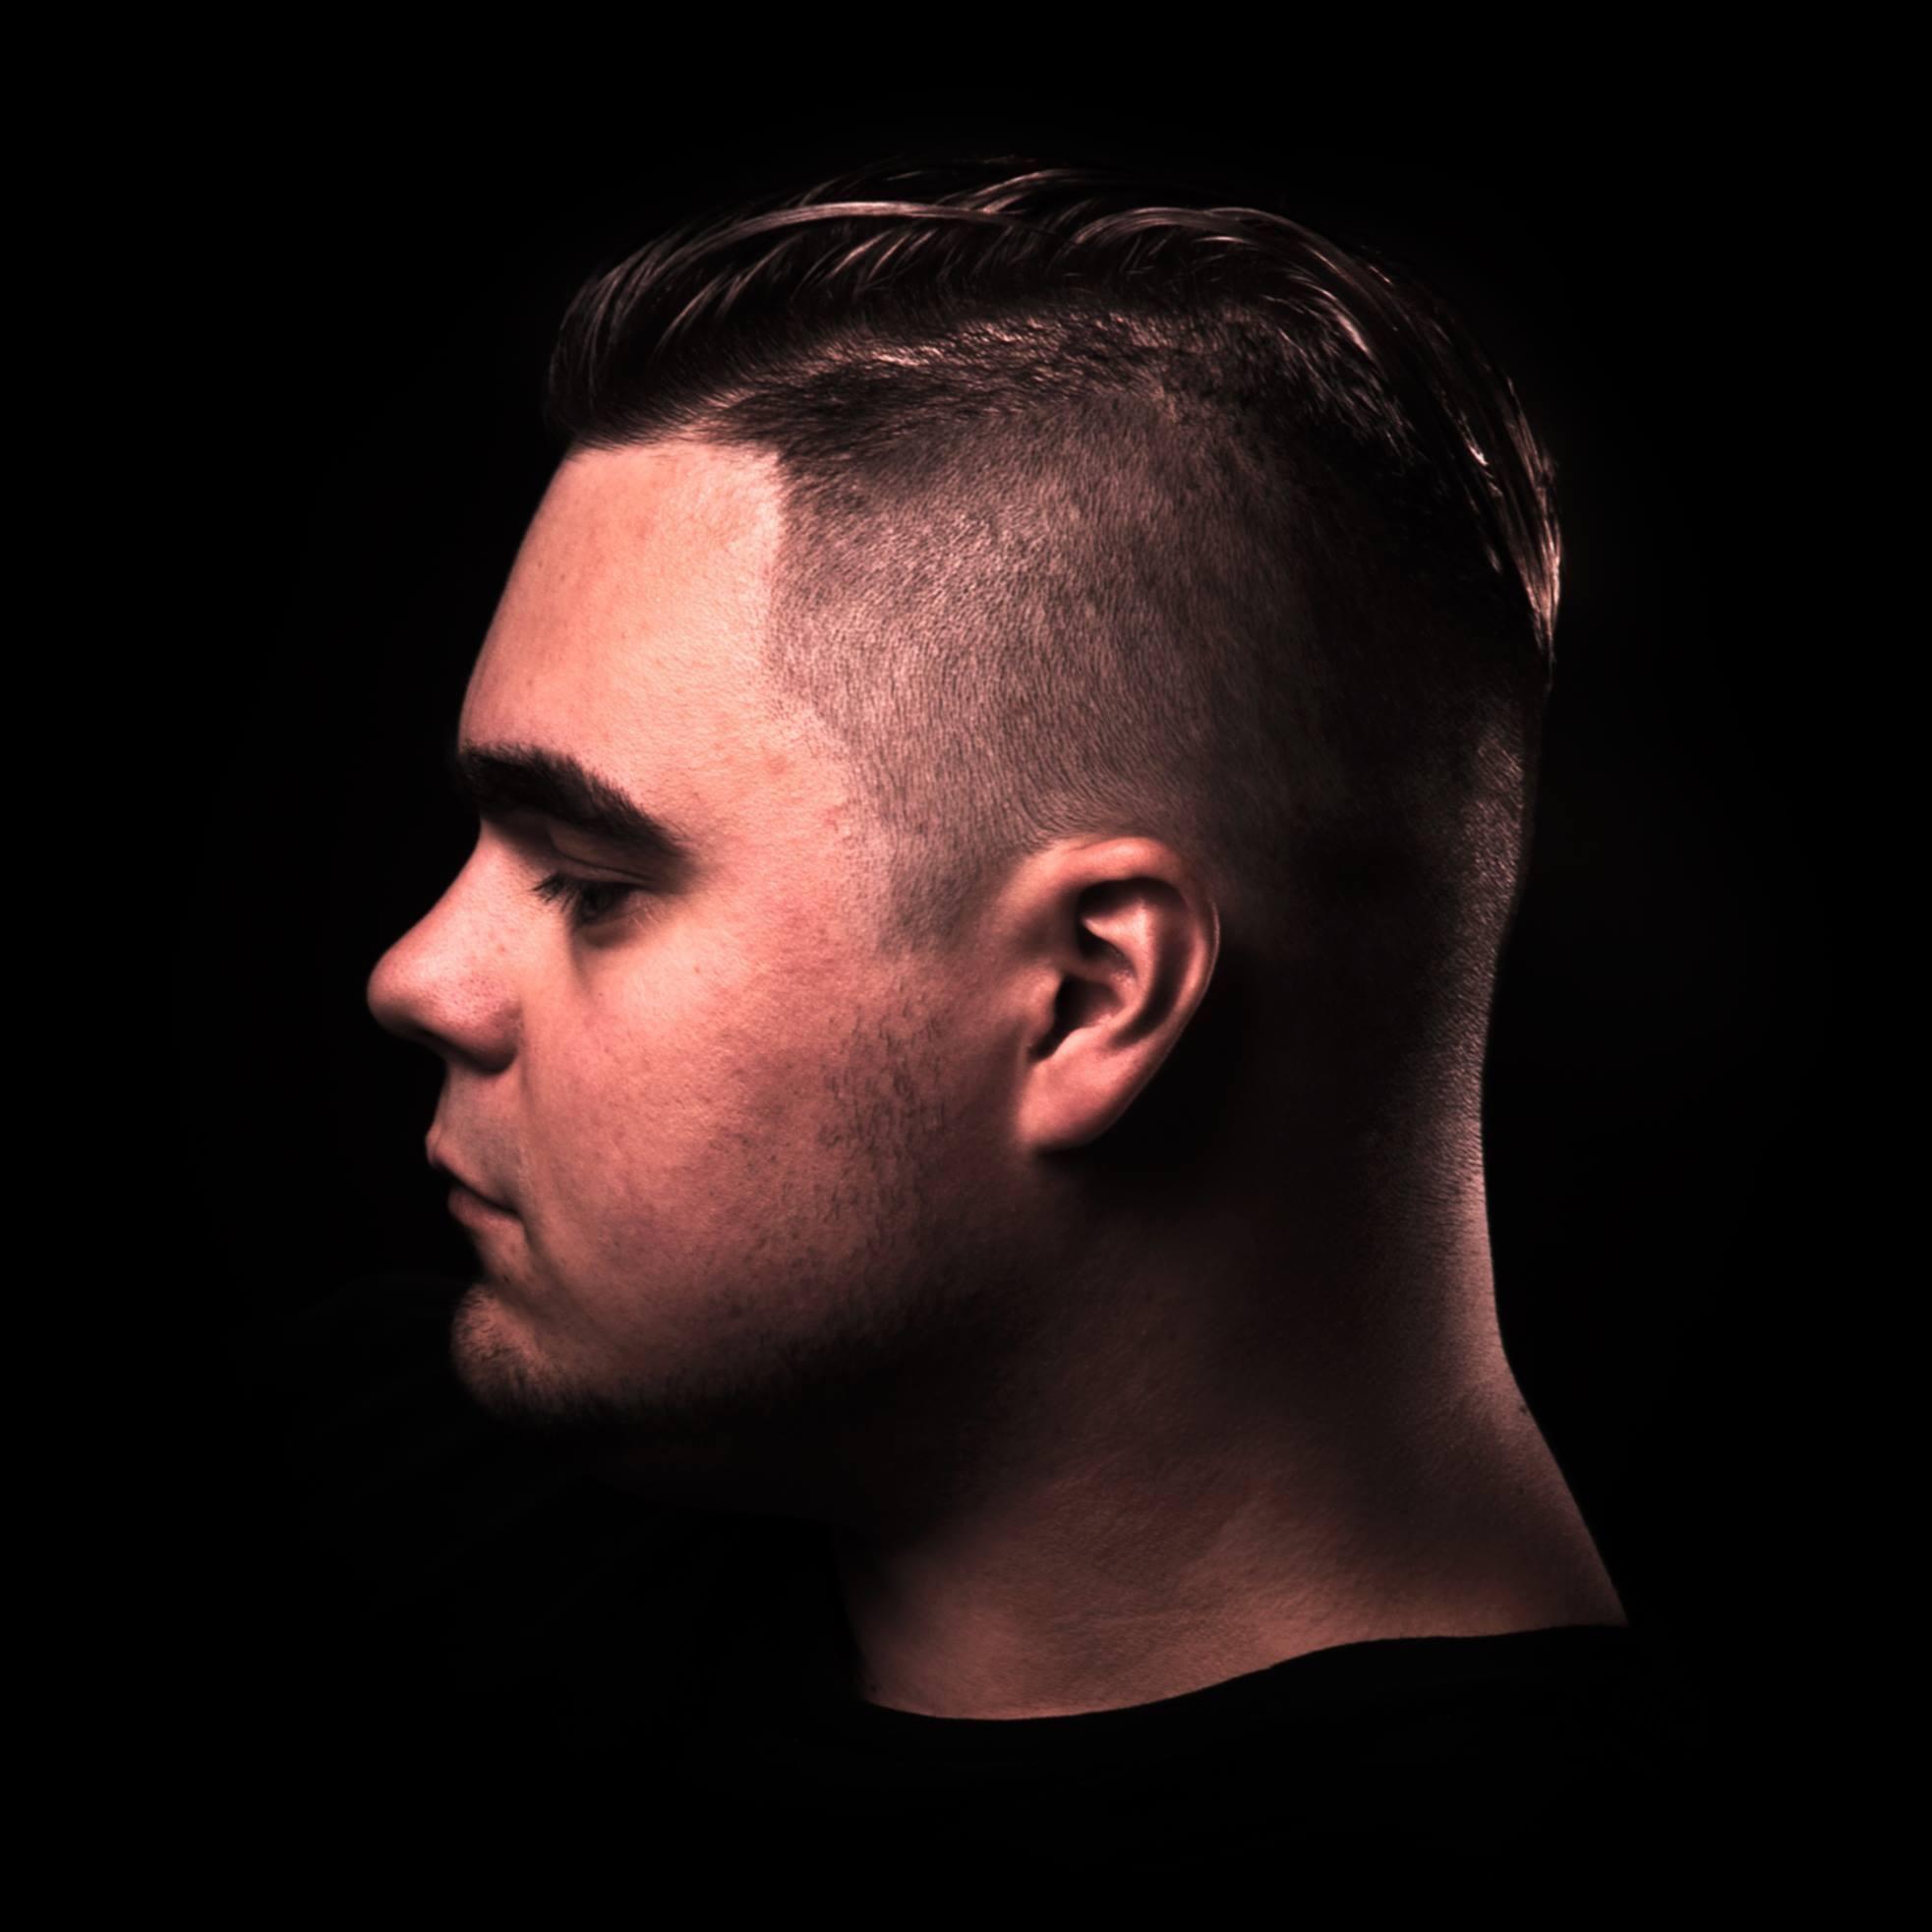 Go to Tomáš Lištiak's profile